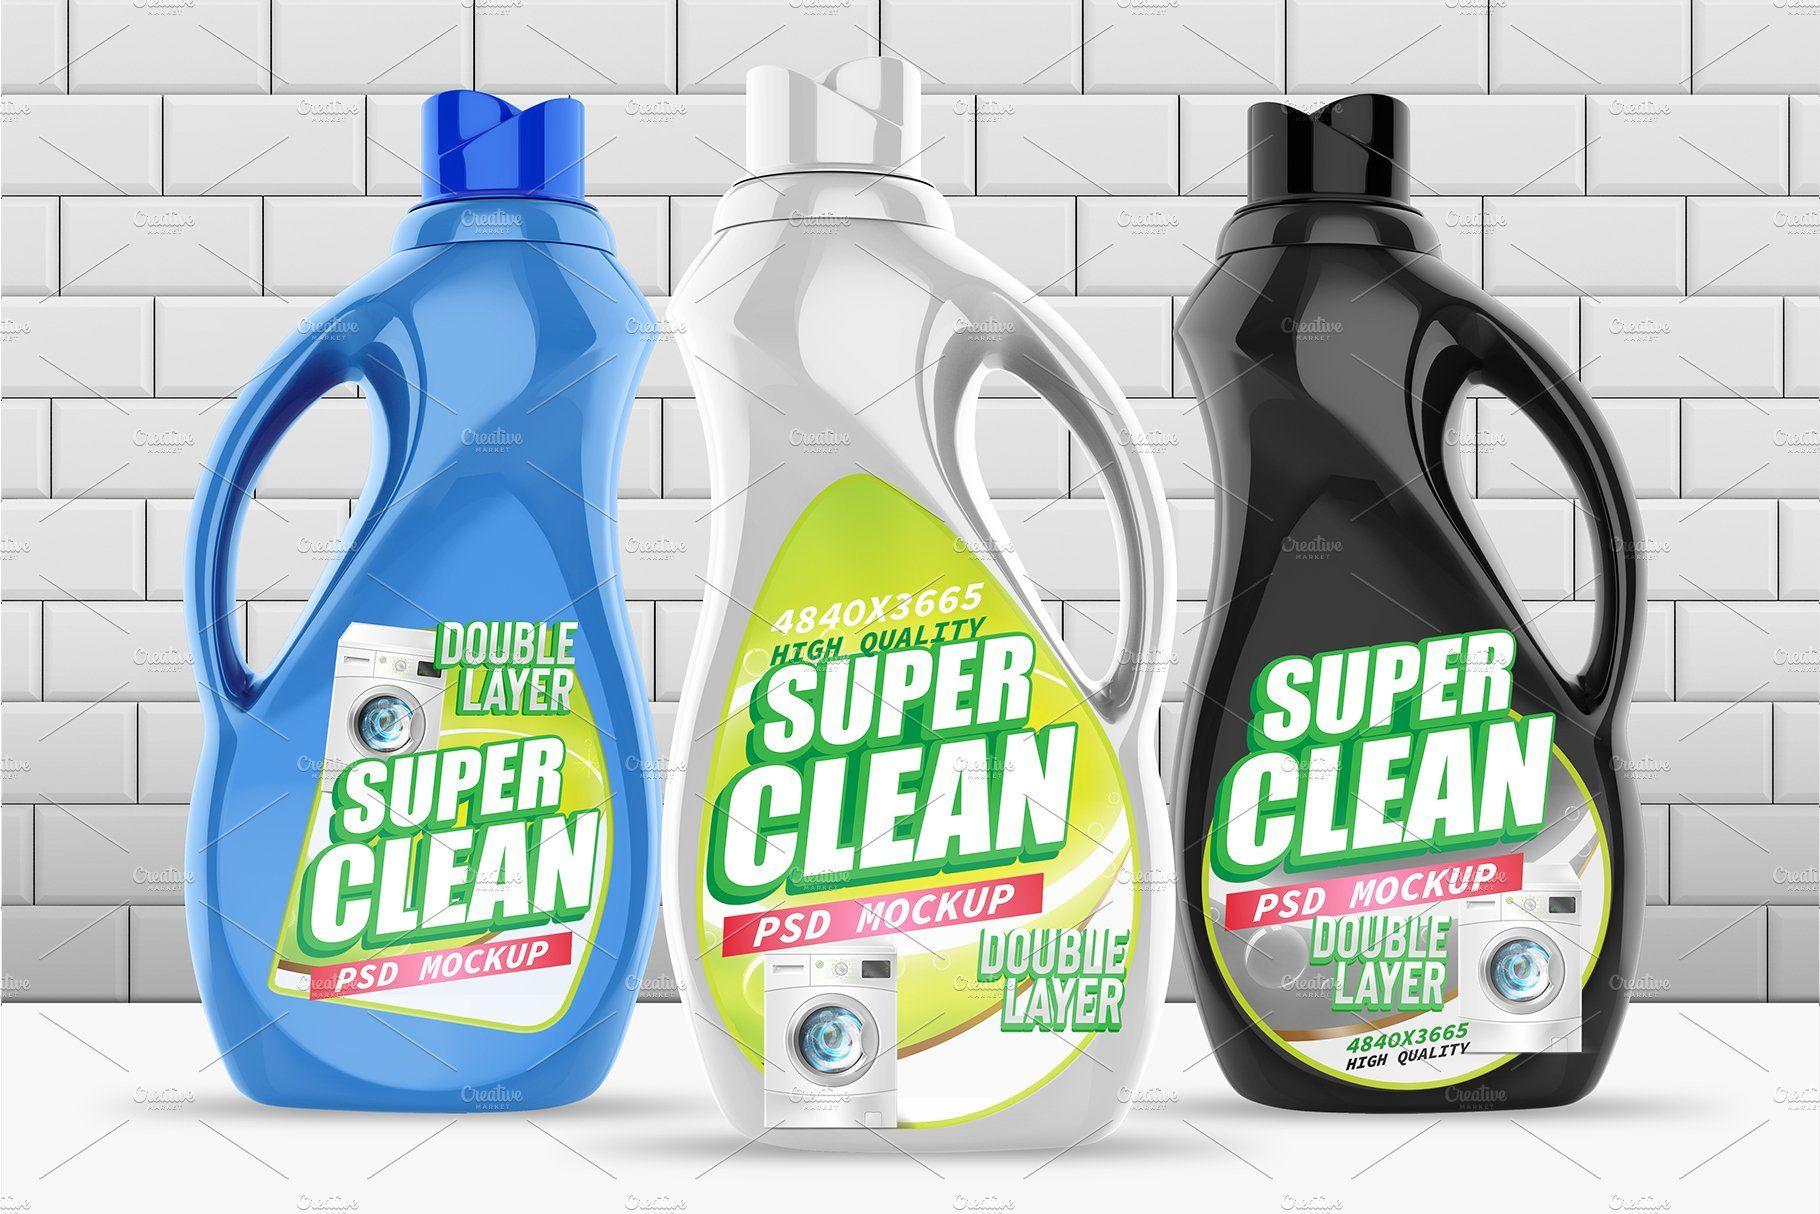 Laundry Detergent Bottle Psd Mockups Laundry Detergent Bottles